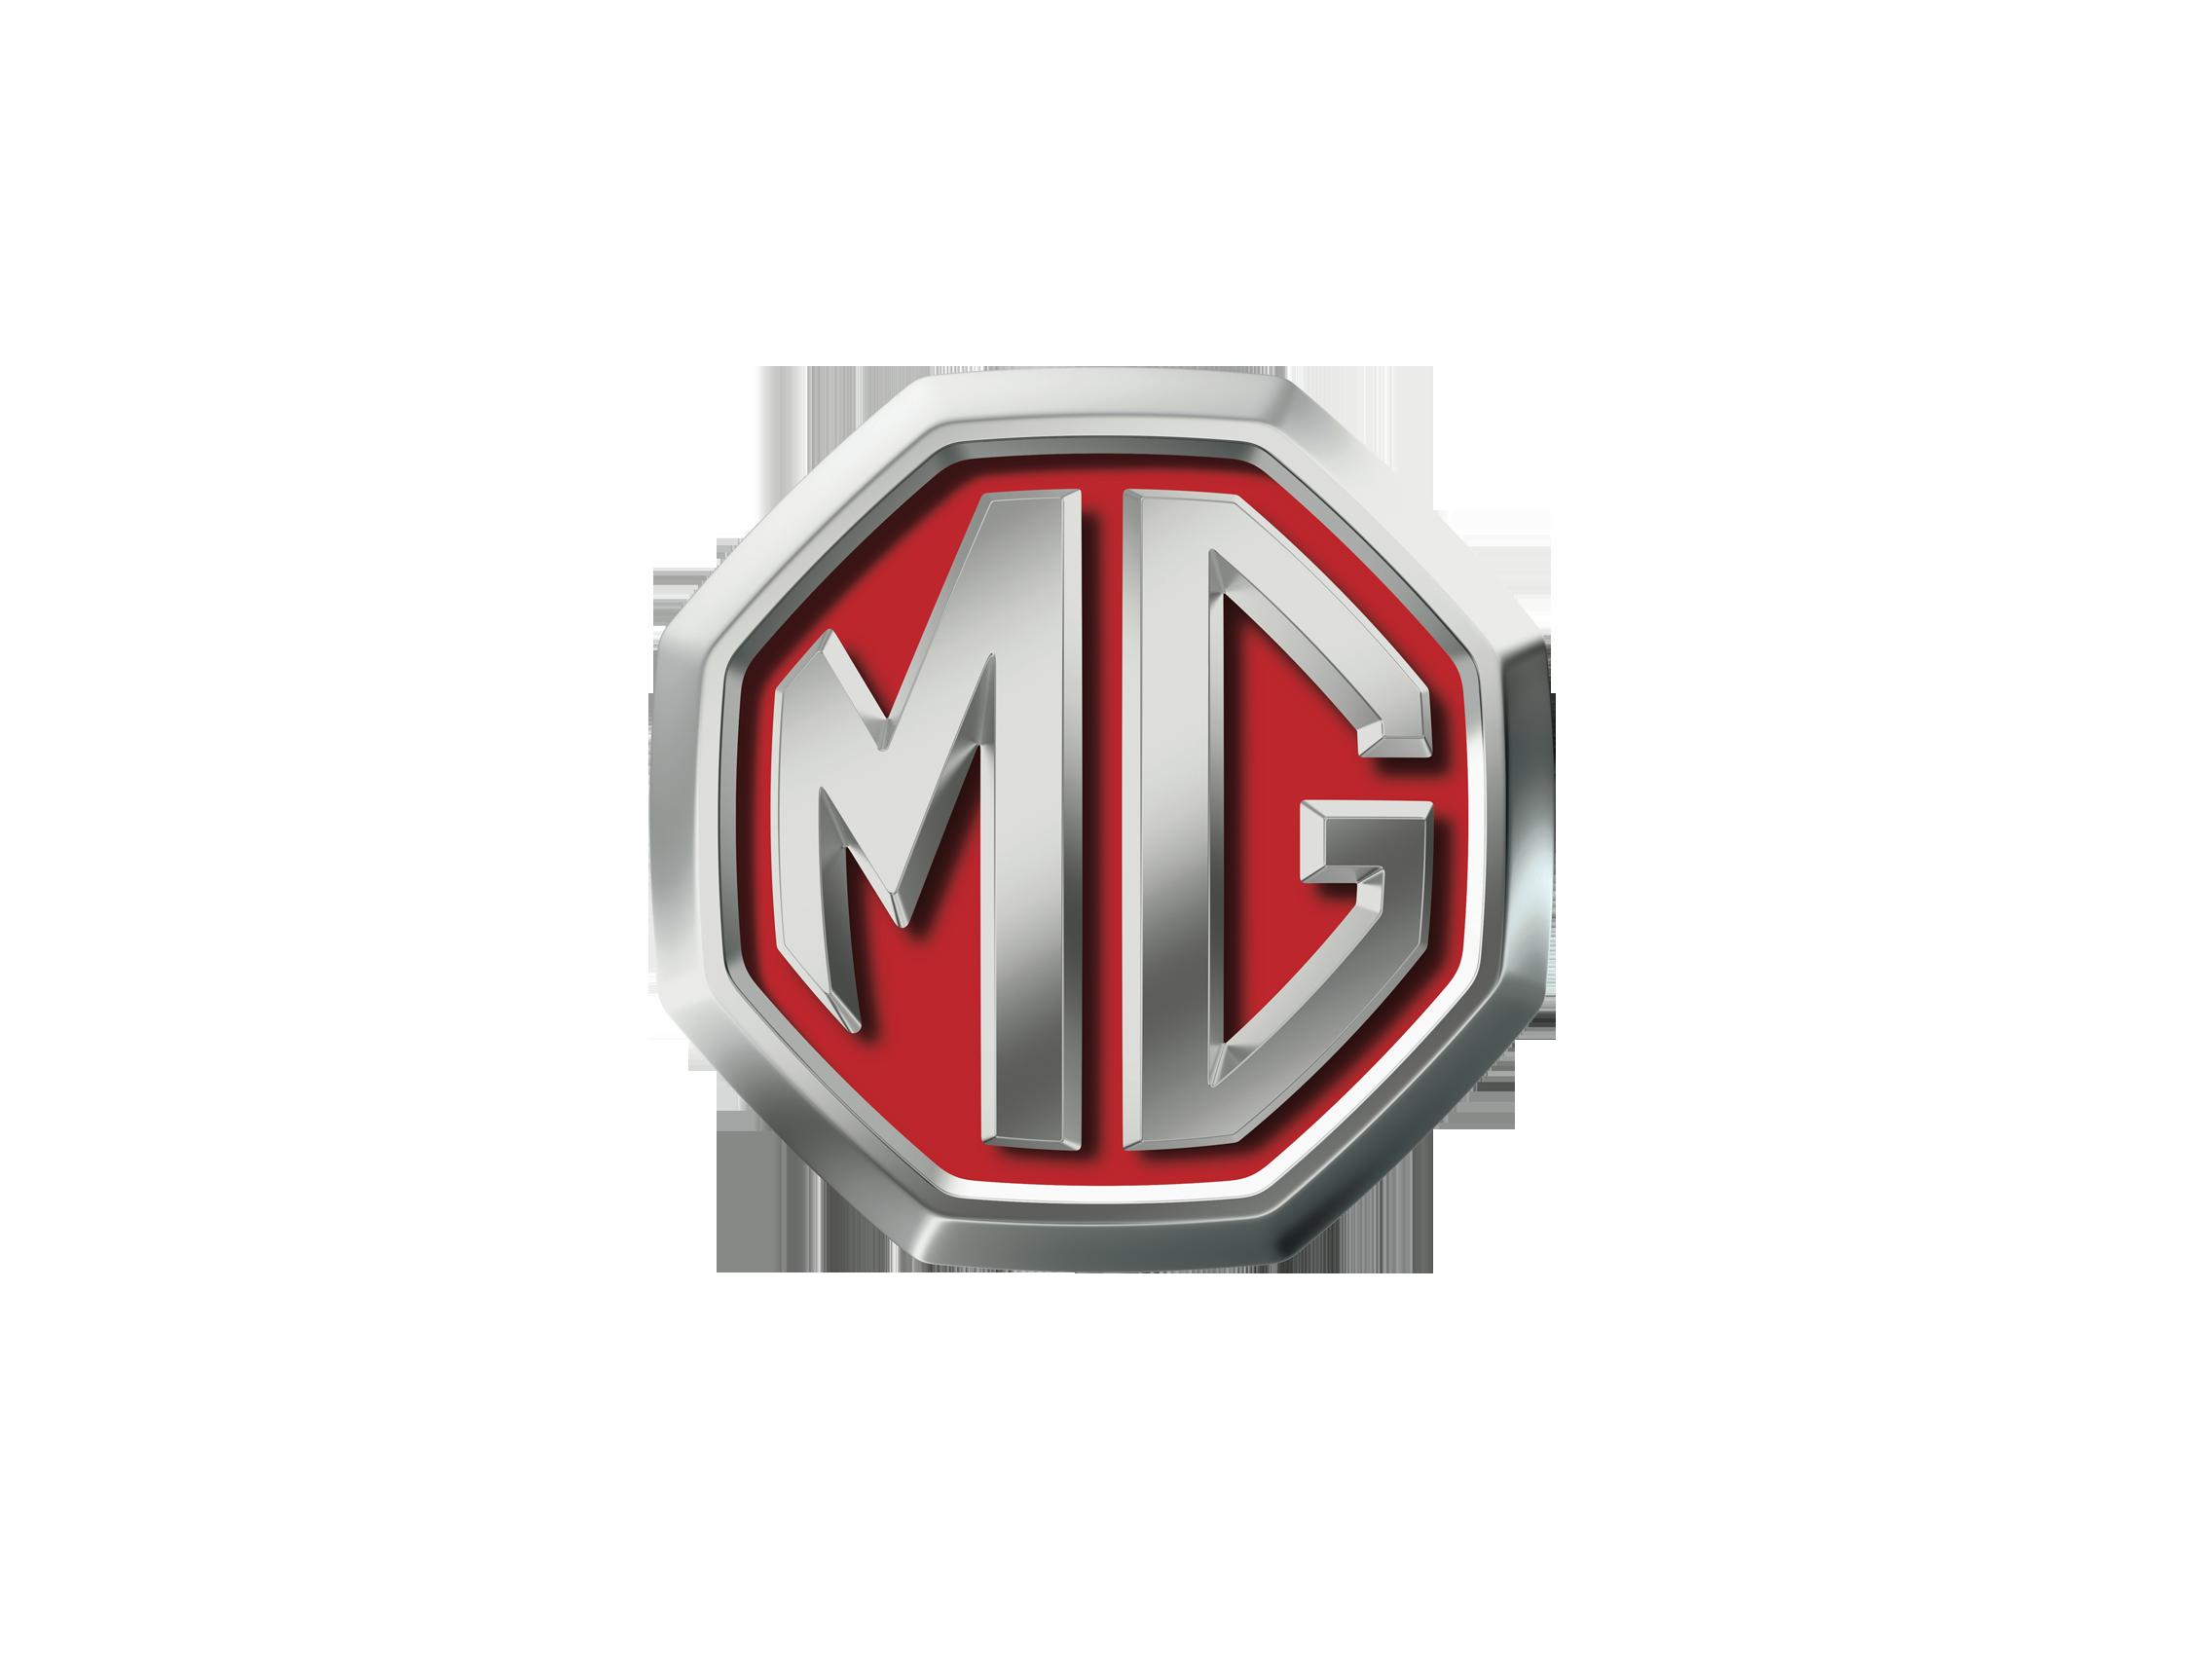 MG-logo-red-2010-1920x1080